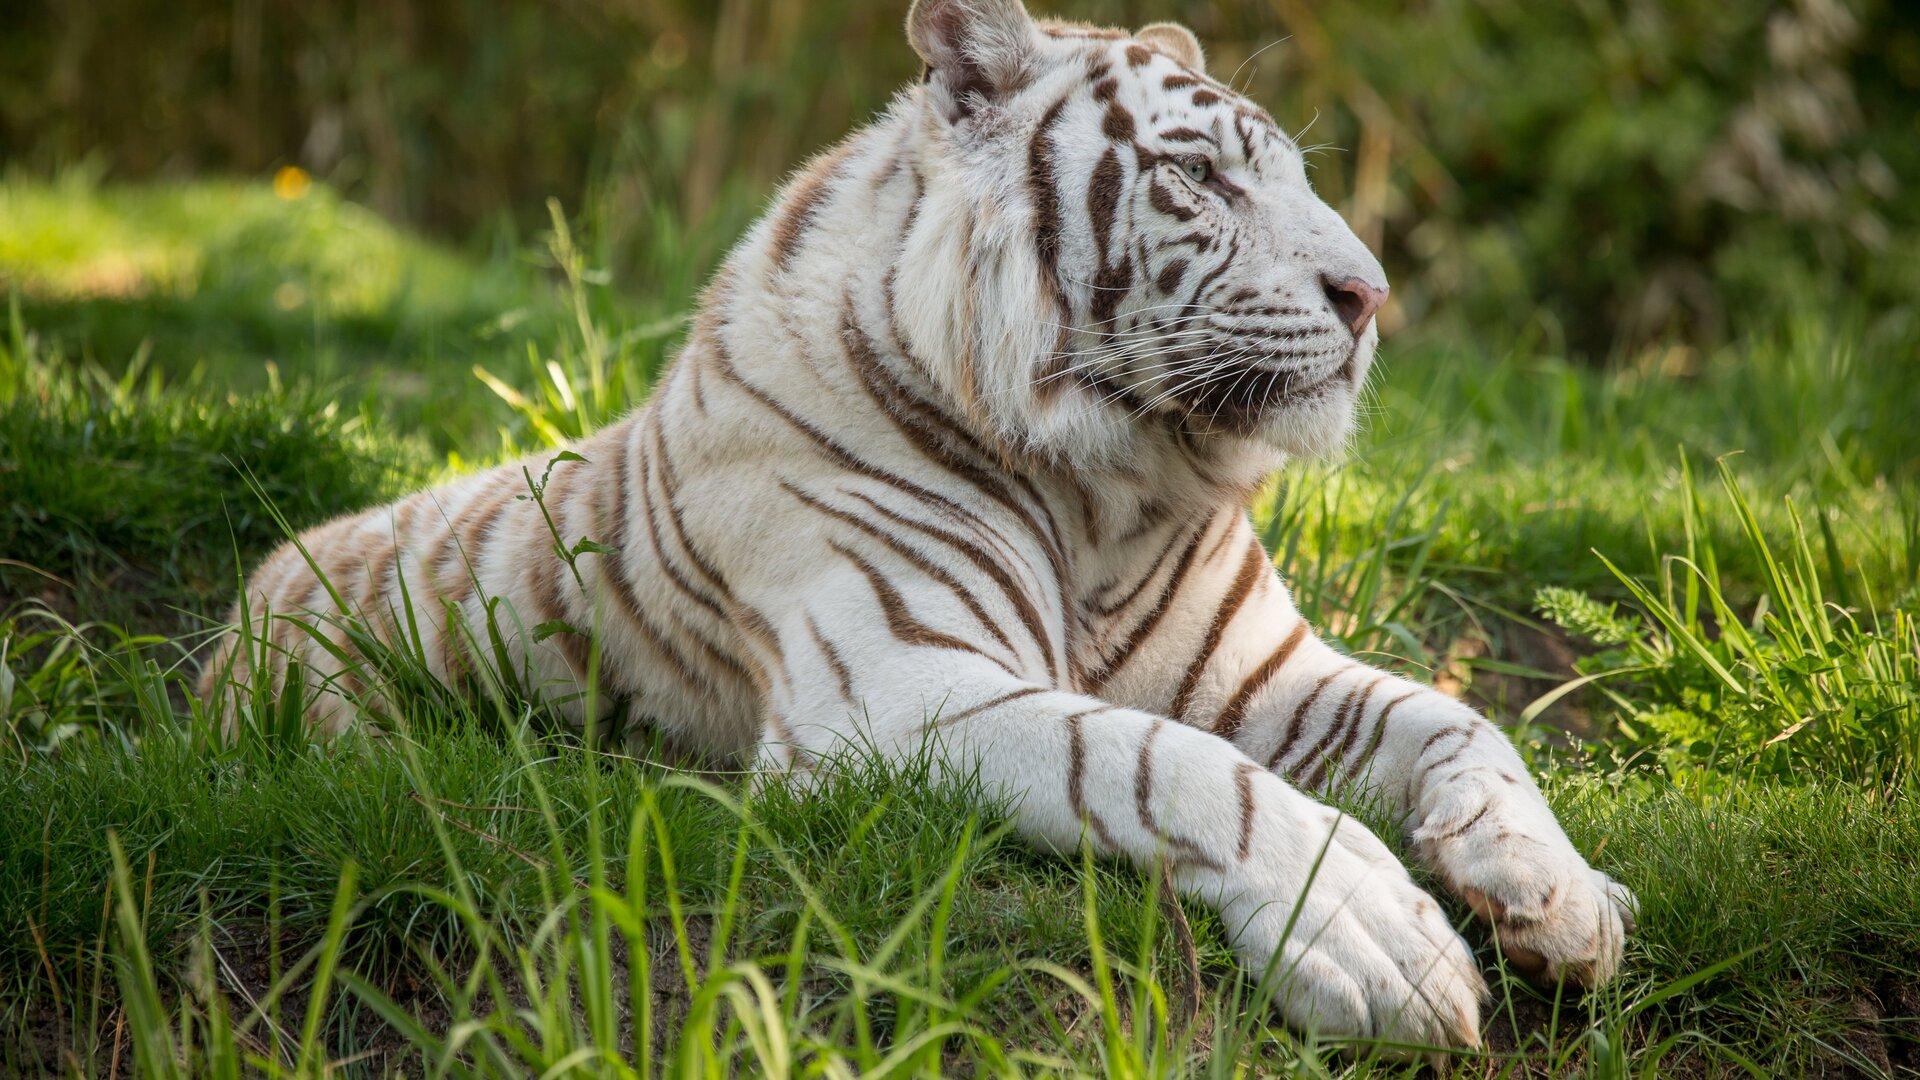 White Tiger Wallpaper 1080p 1920x1080 White...